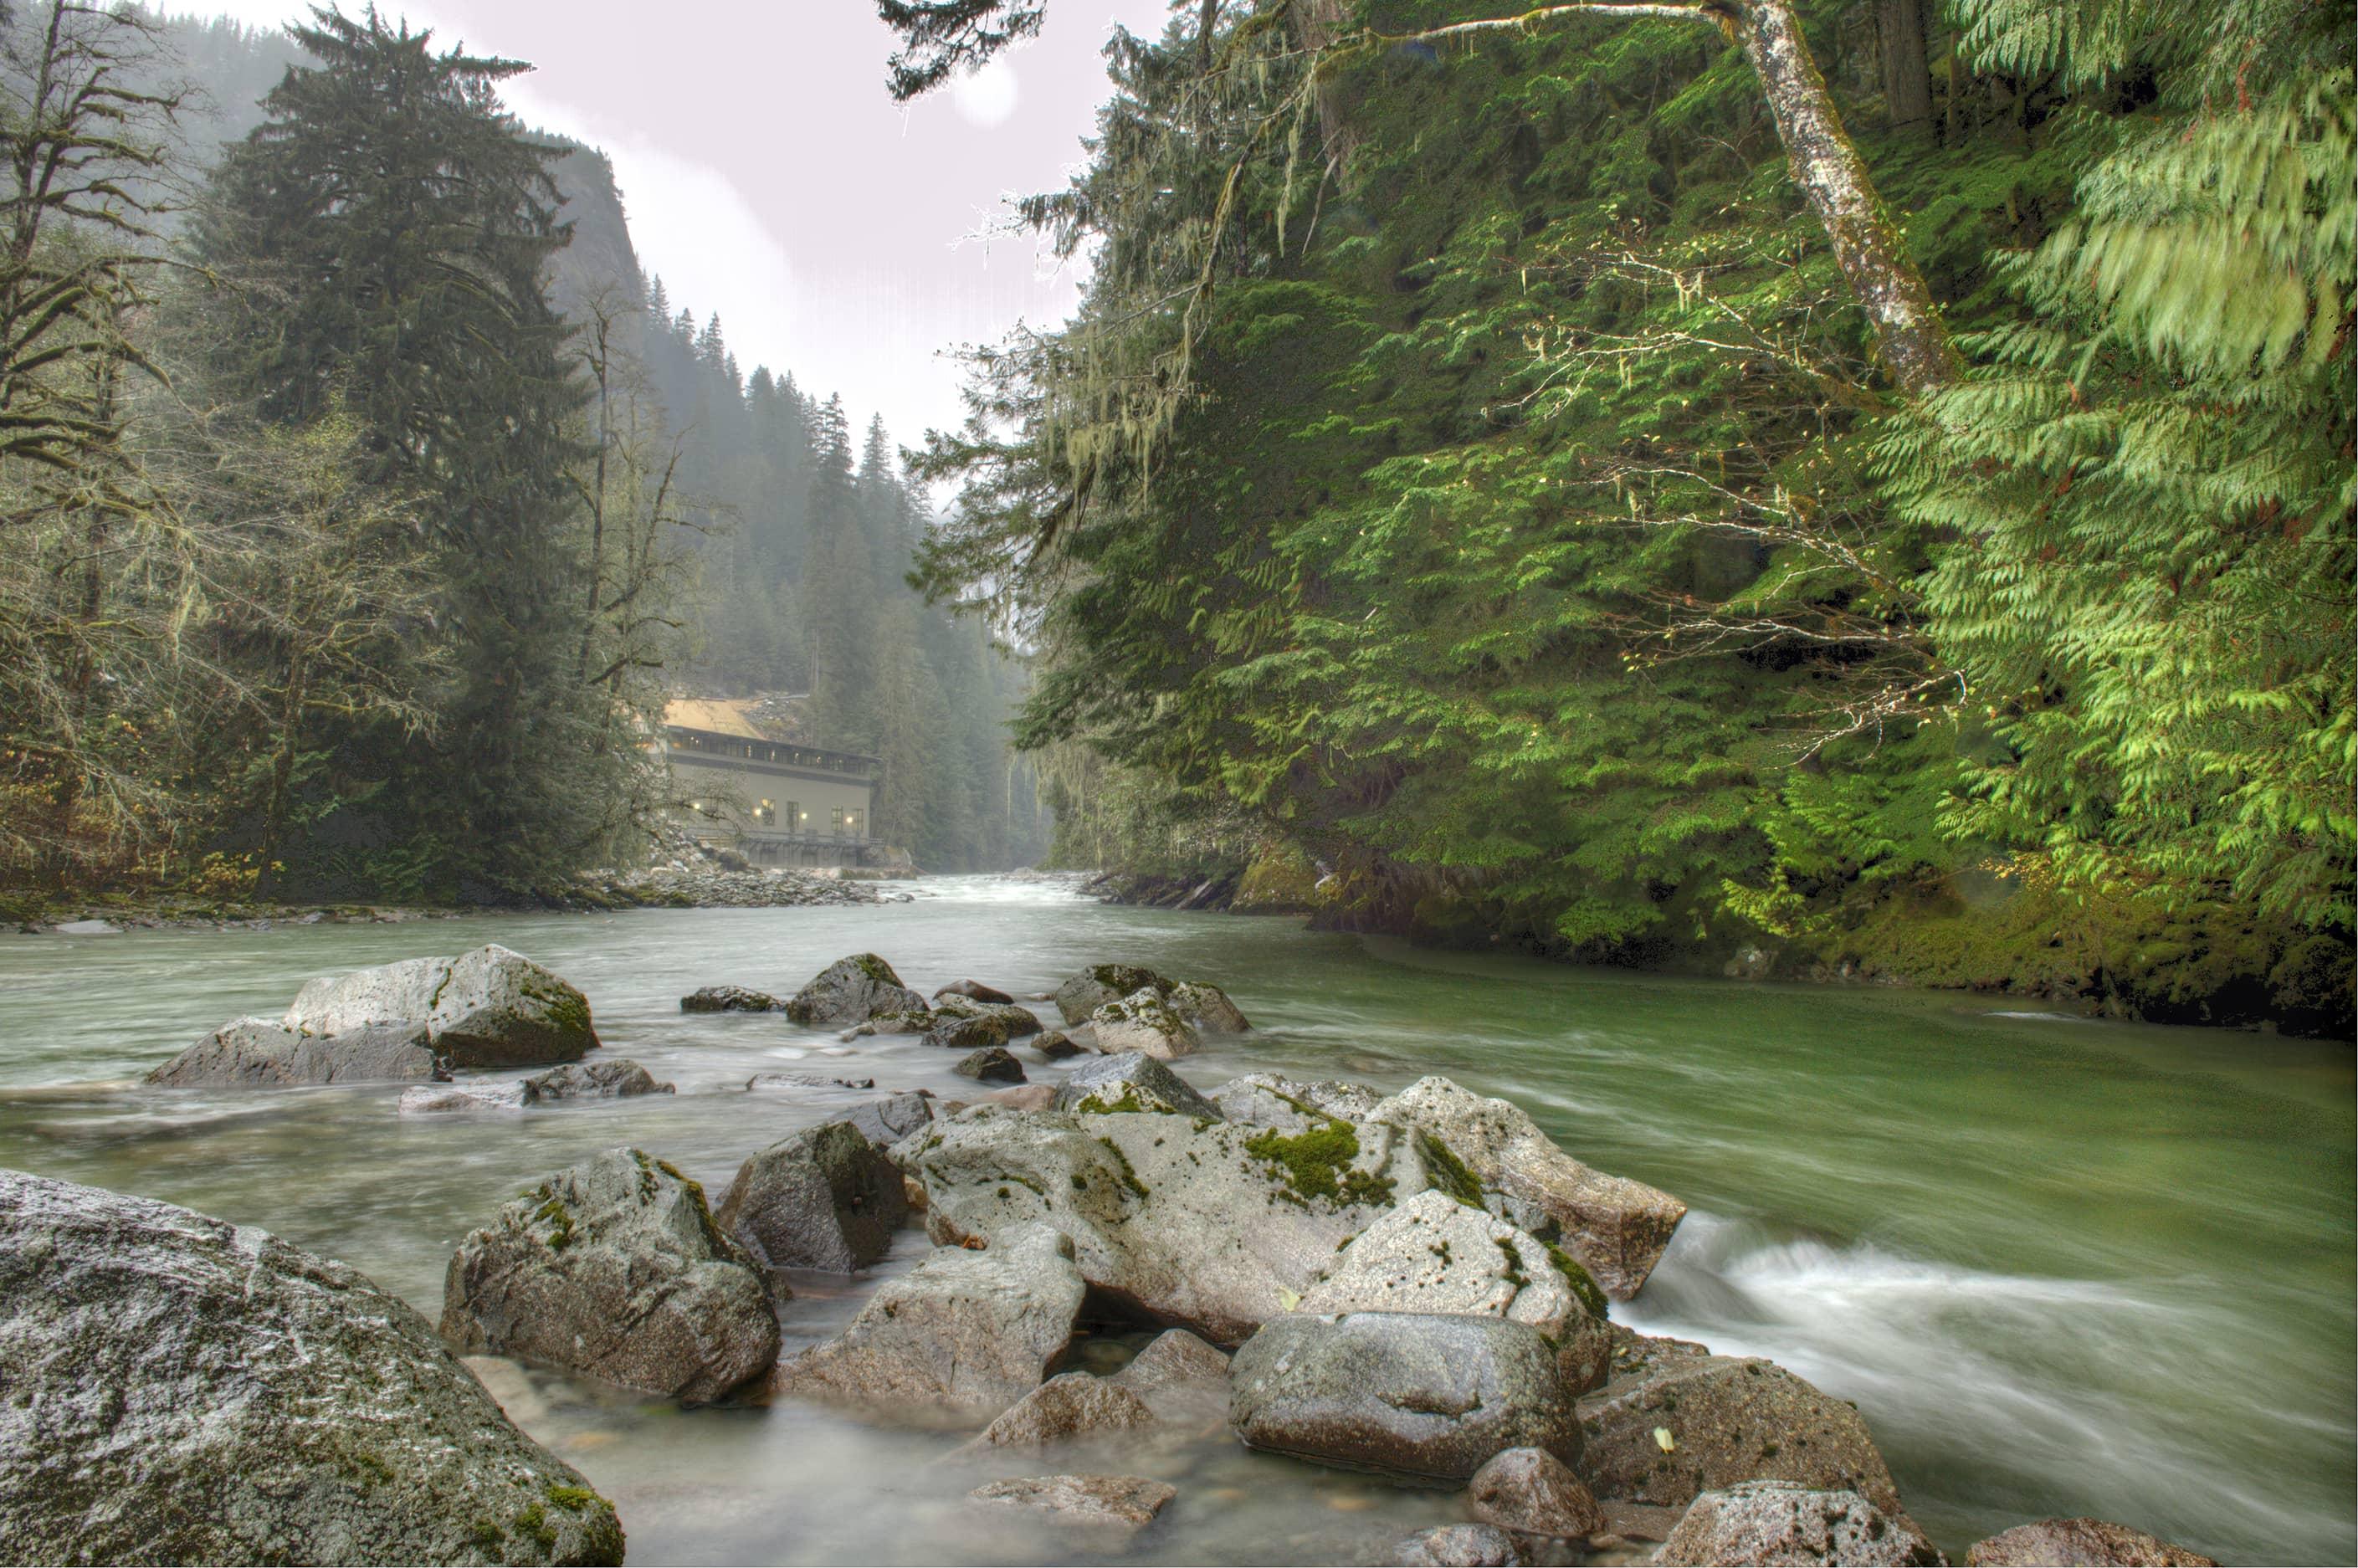 bbp ashlu creek run-of-river hydroelectric plant exterior far away